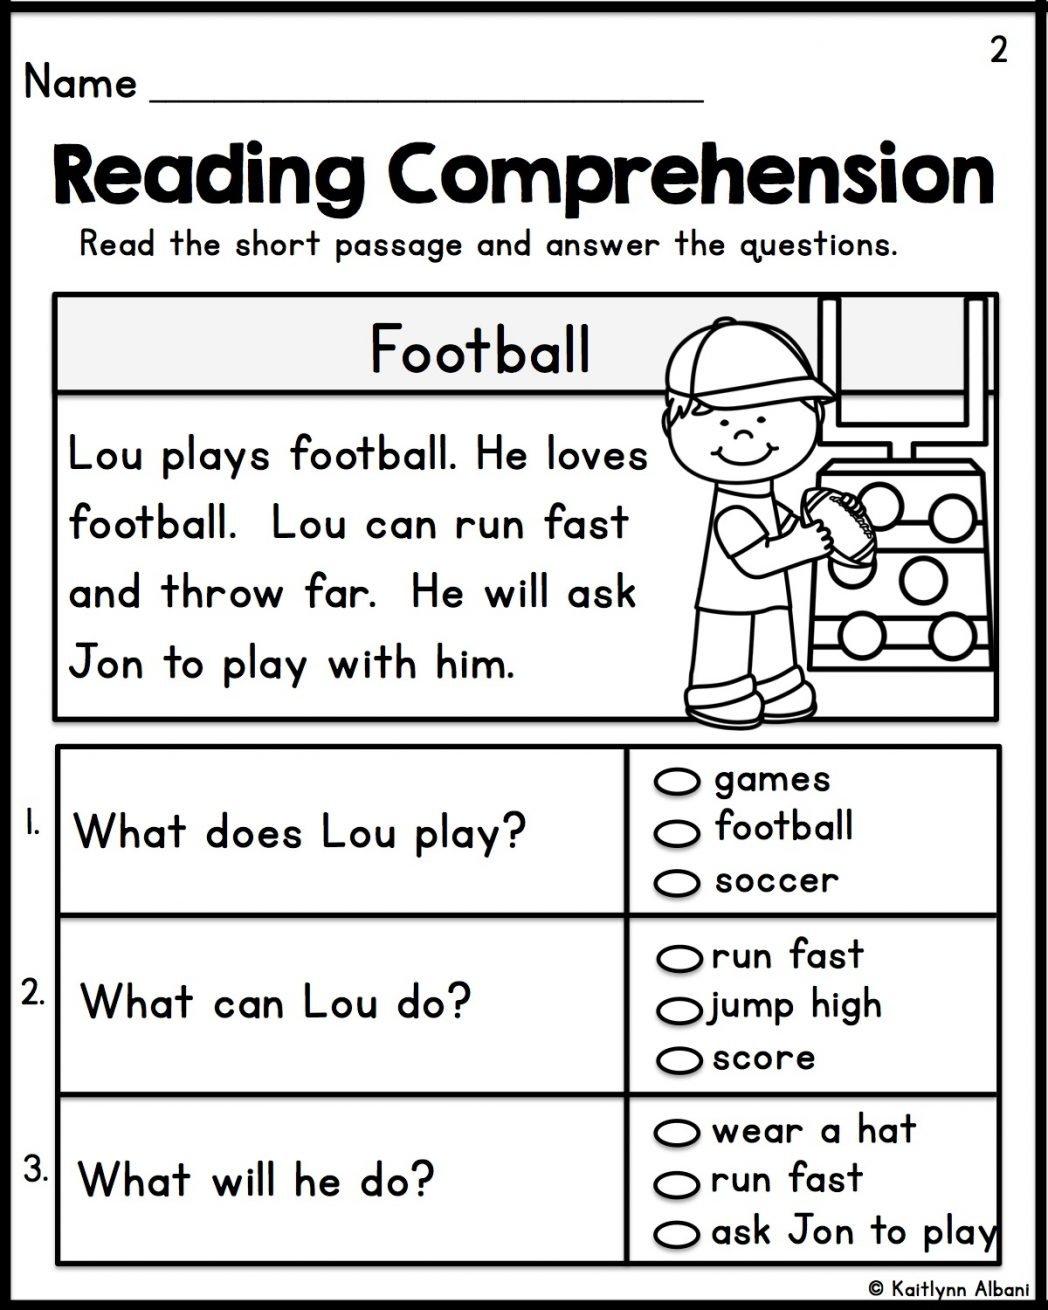 Kindergarten Reading Printable Worksheets 85 Images In Collection Throughout Kindergarten Reading Printable Worksheets